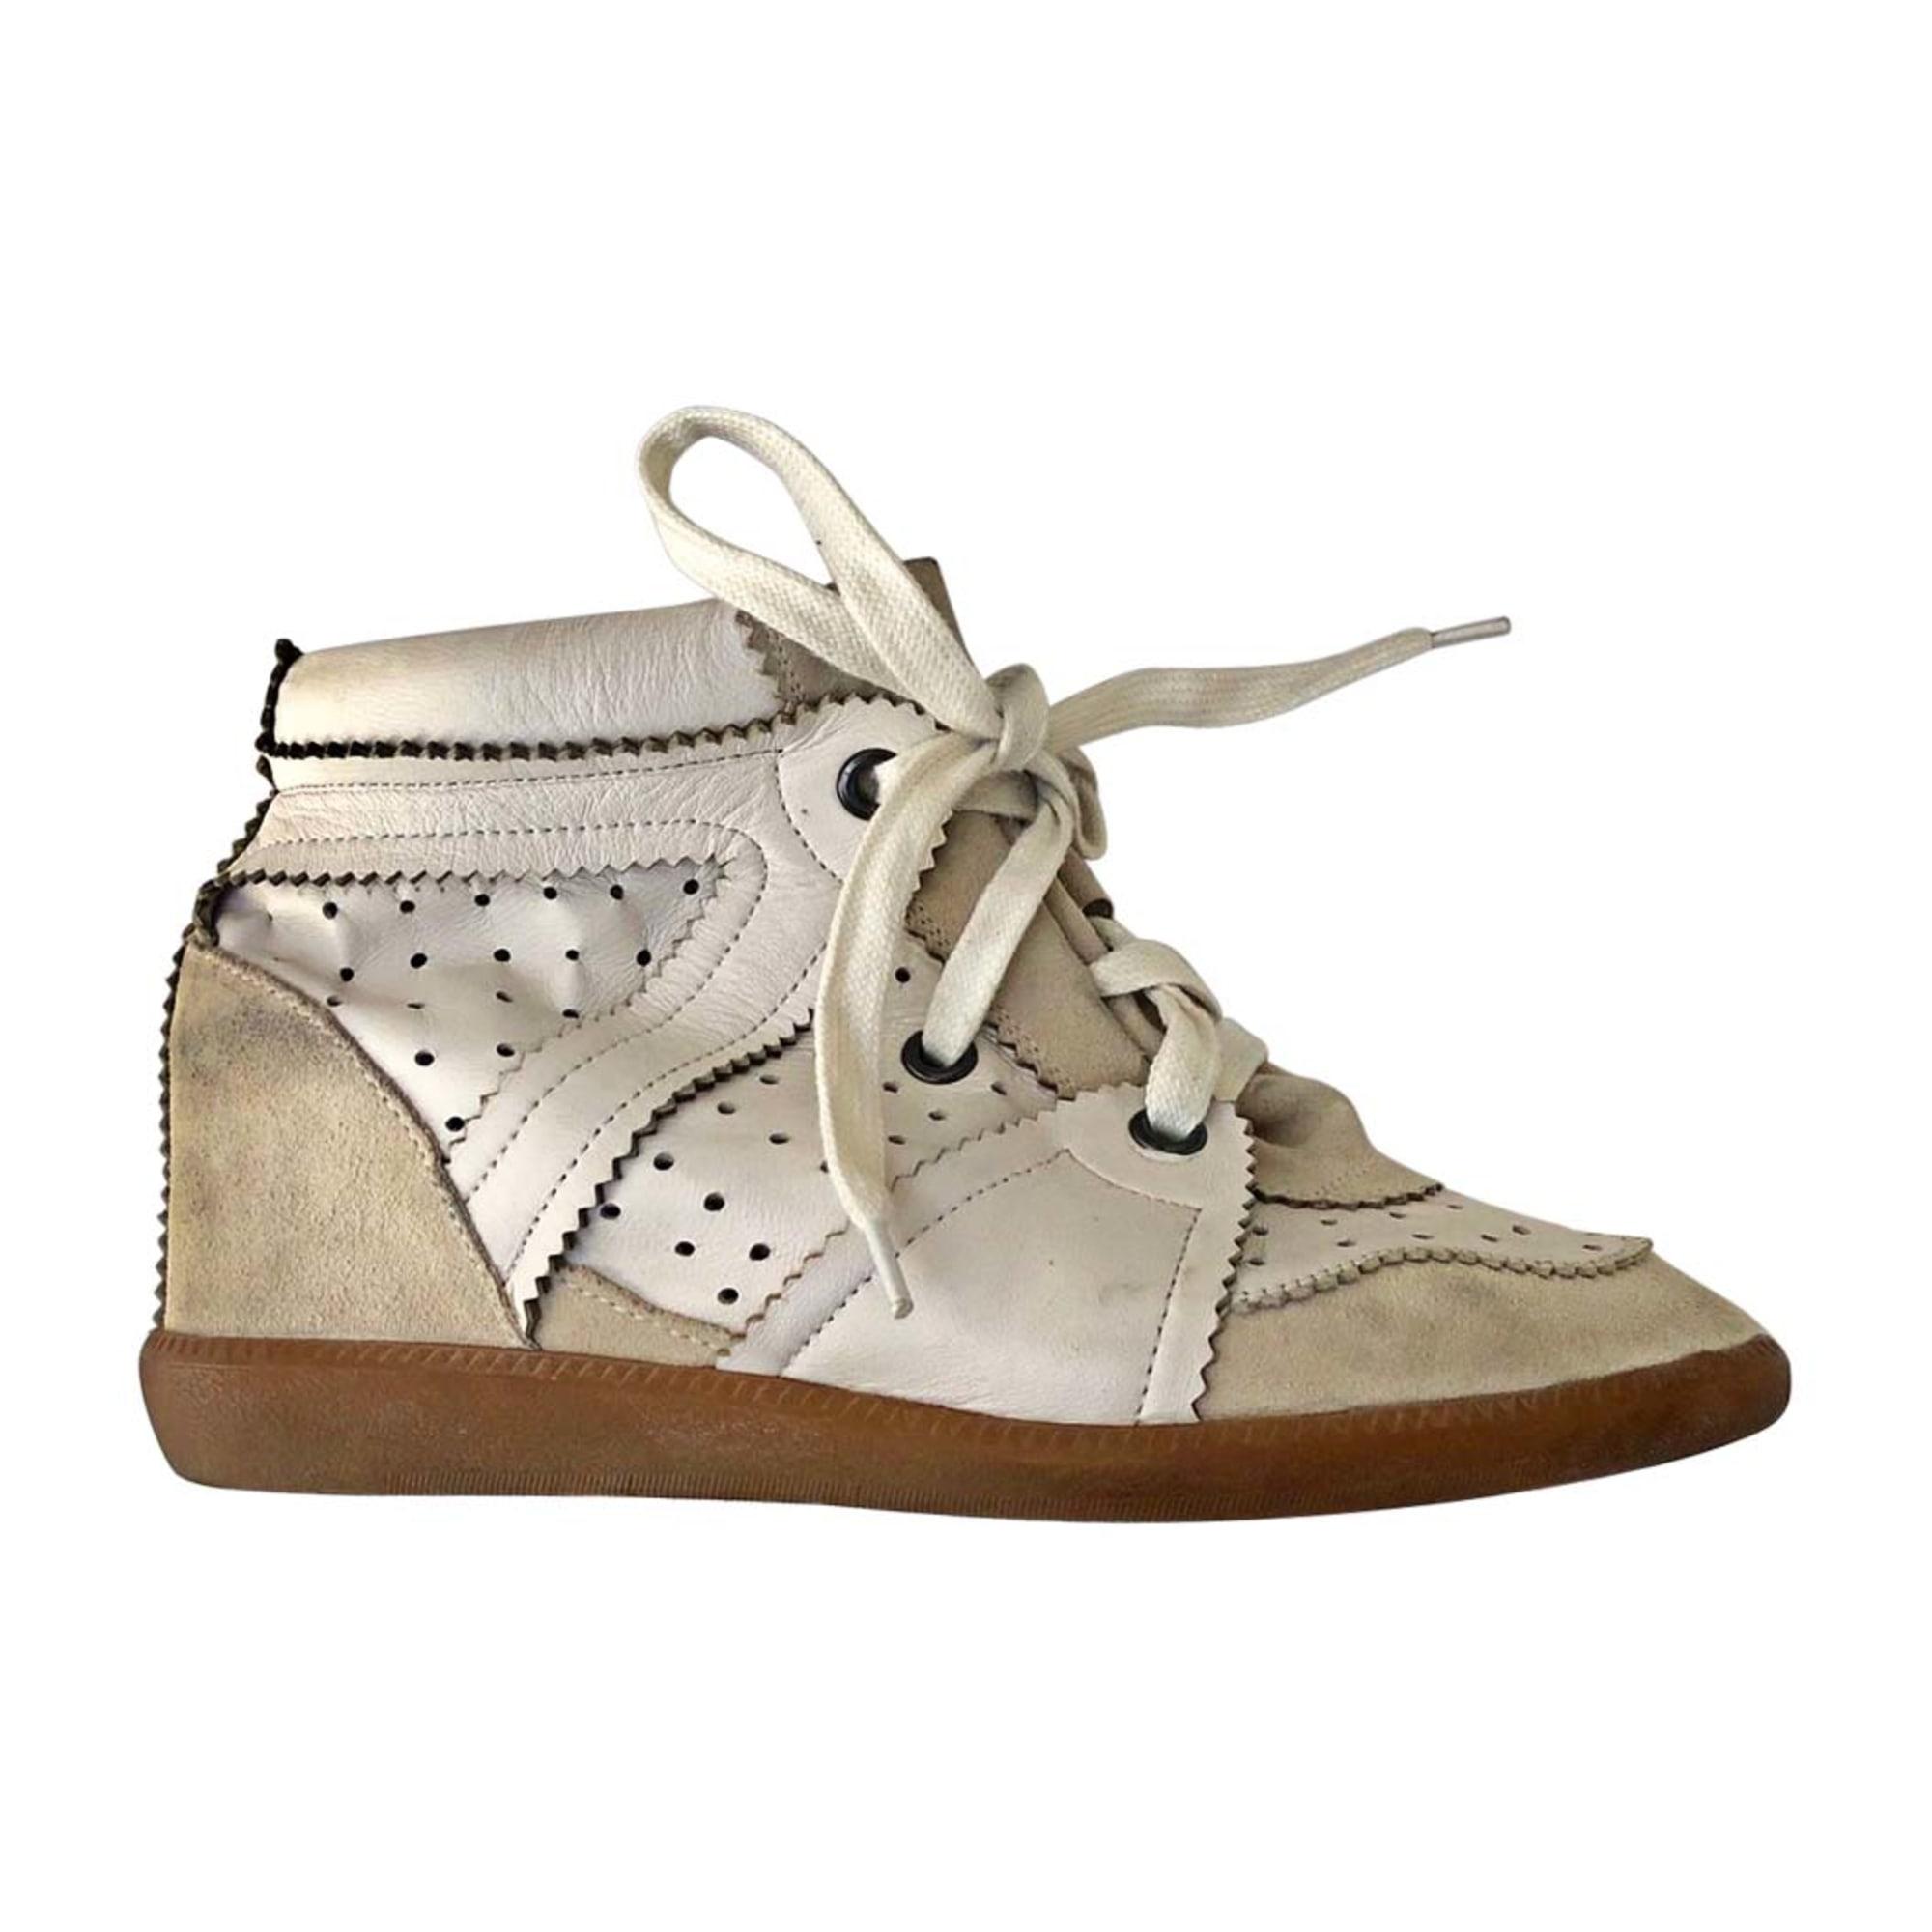 Sneakers ISABEL MARANT White, off-white, ecru